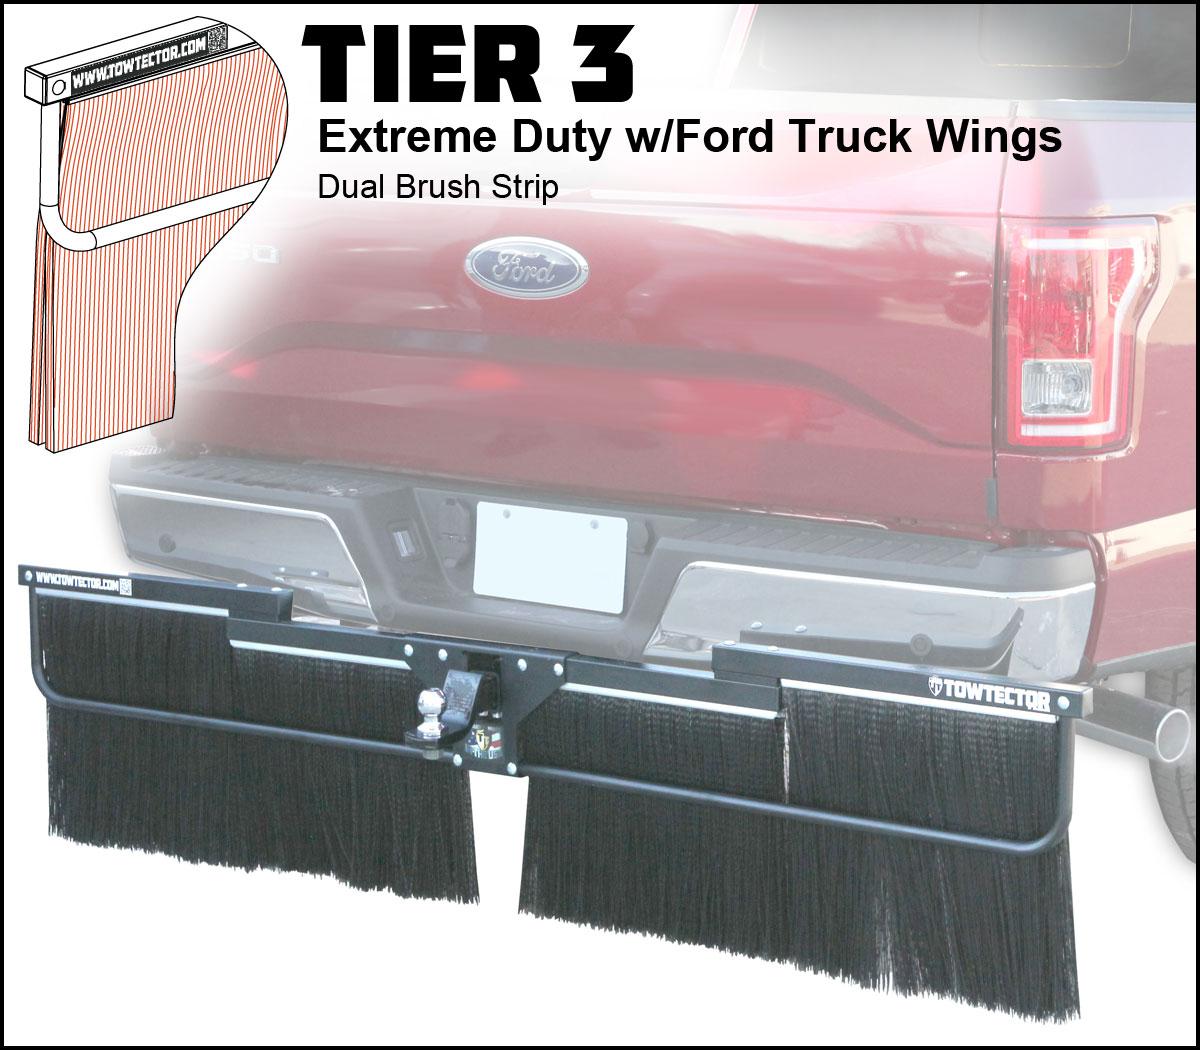 tier-3-w-ford-truck.jpg